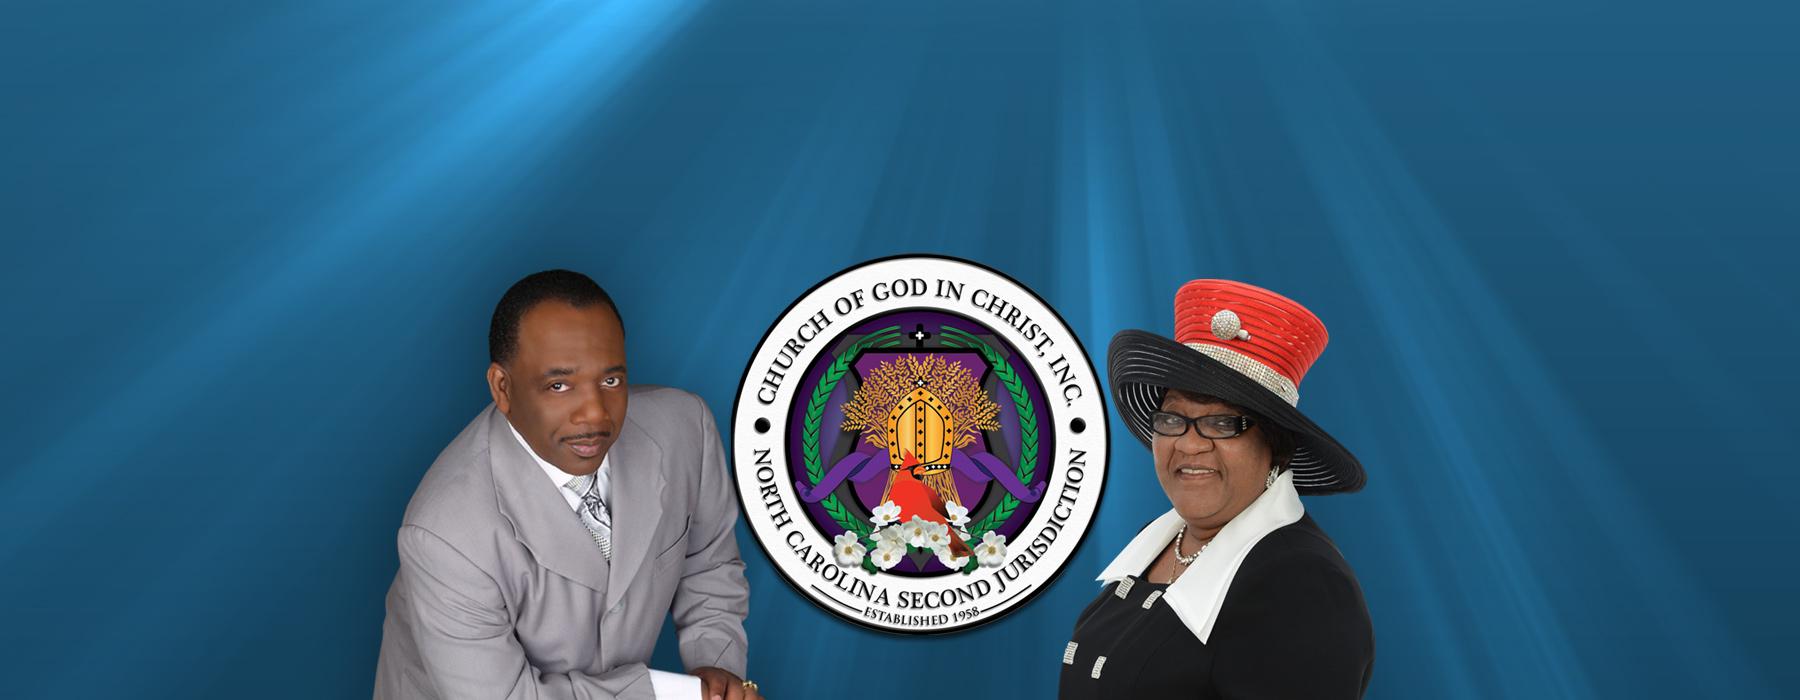 NC2cogic org | North Carolina Second Ecclesiastical Jurisdiction